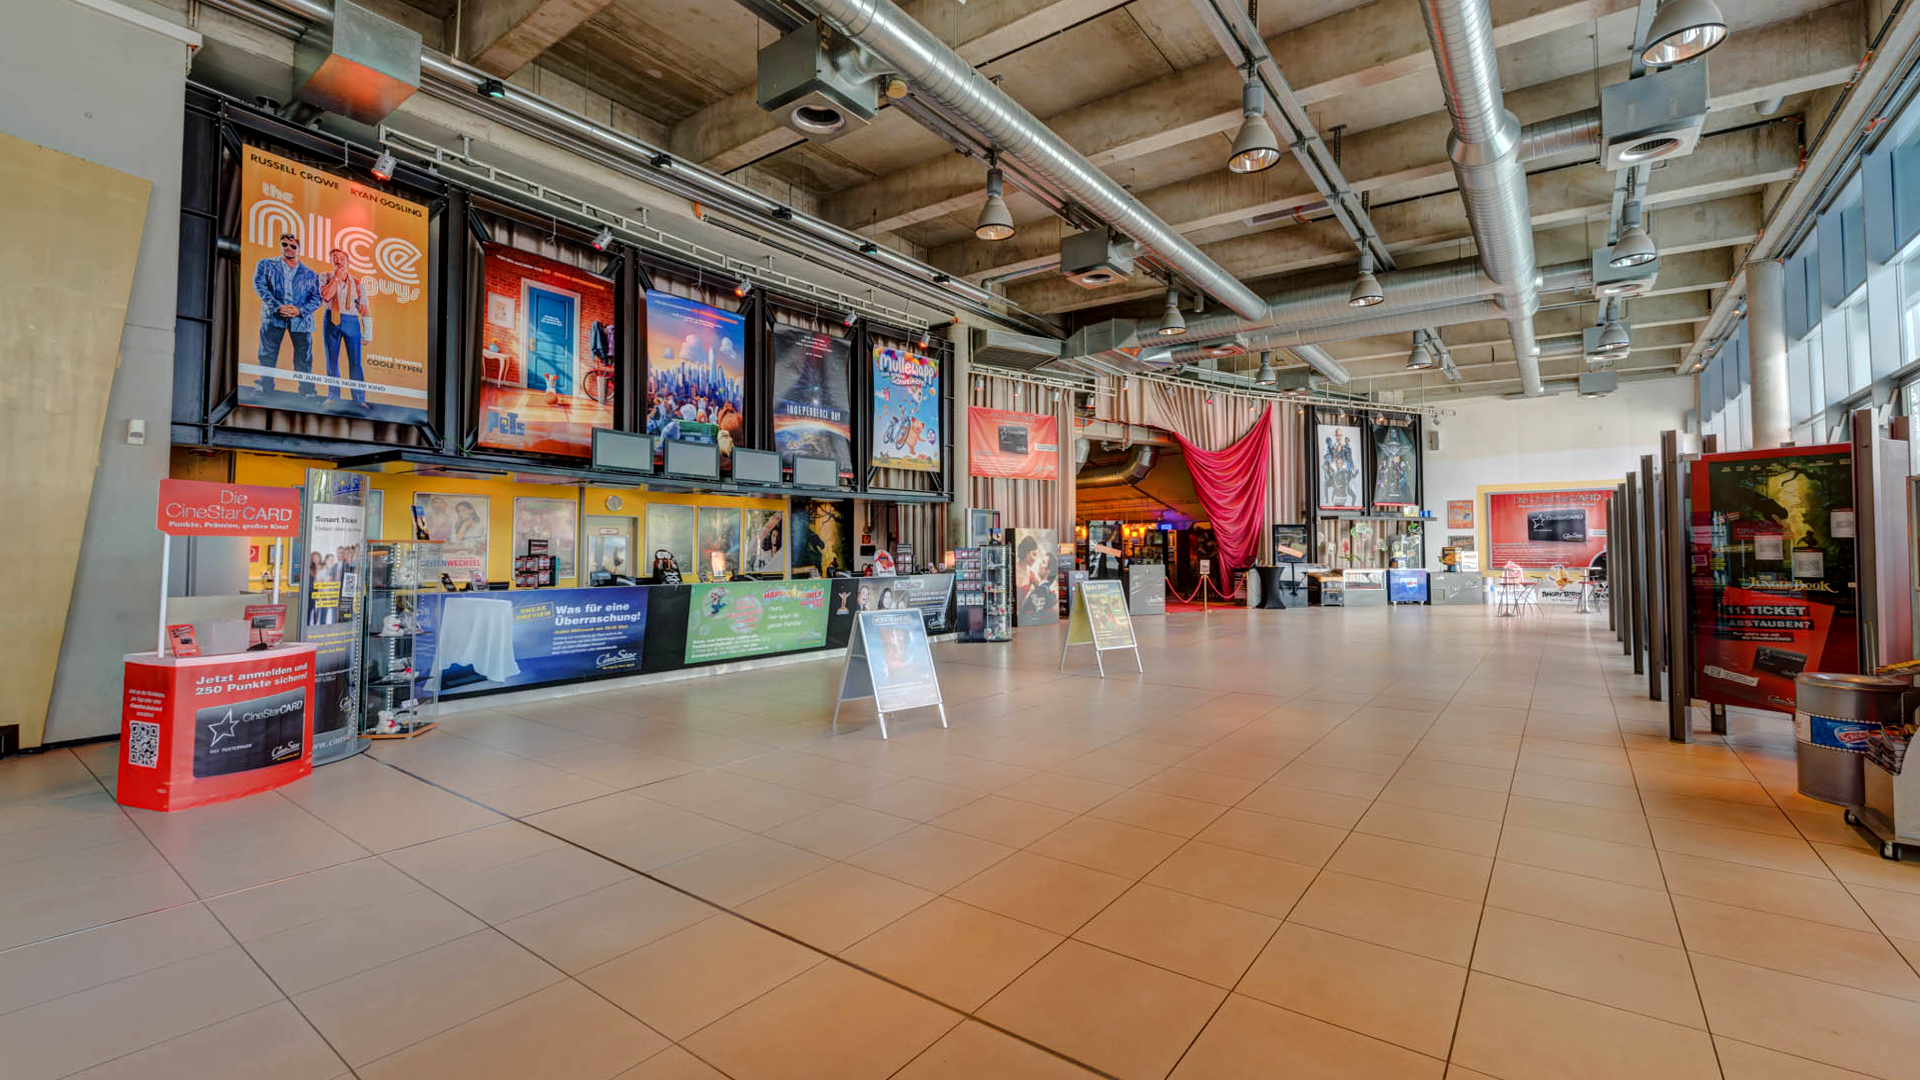 Cinestar - Der Filmpalast Garbsen